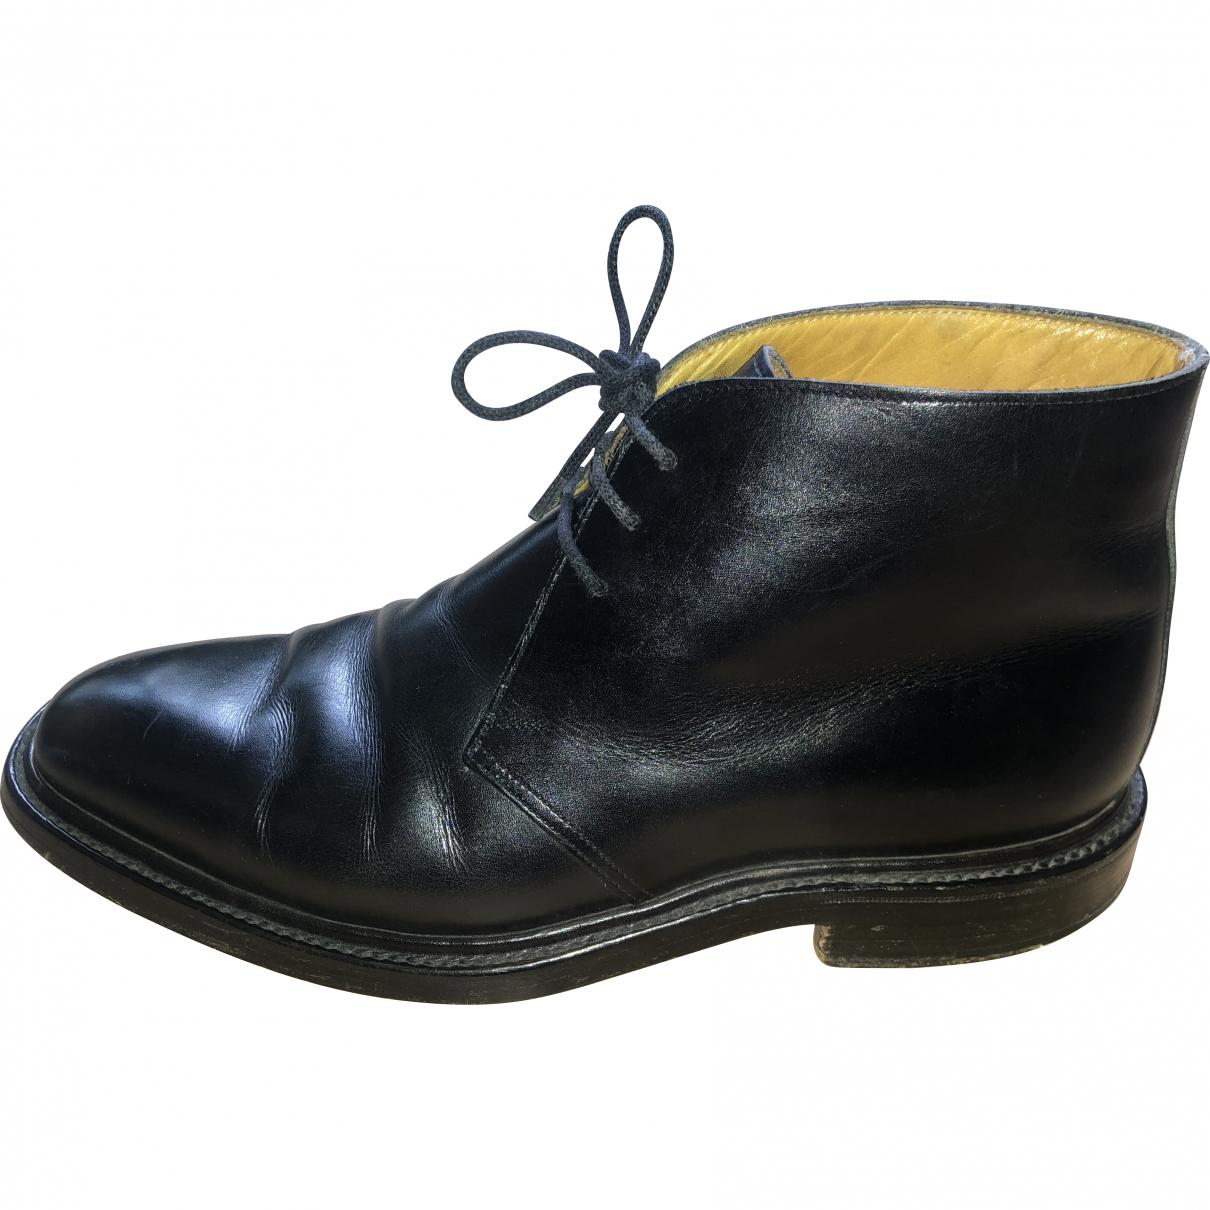 Crockett& Jones \N Black Leather Boots for Men 6.5 US